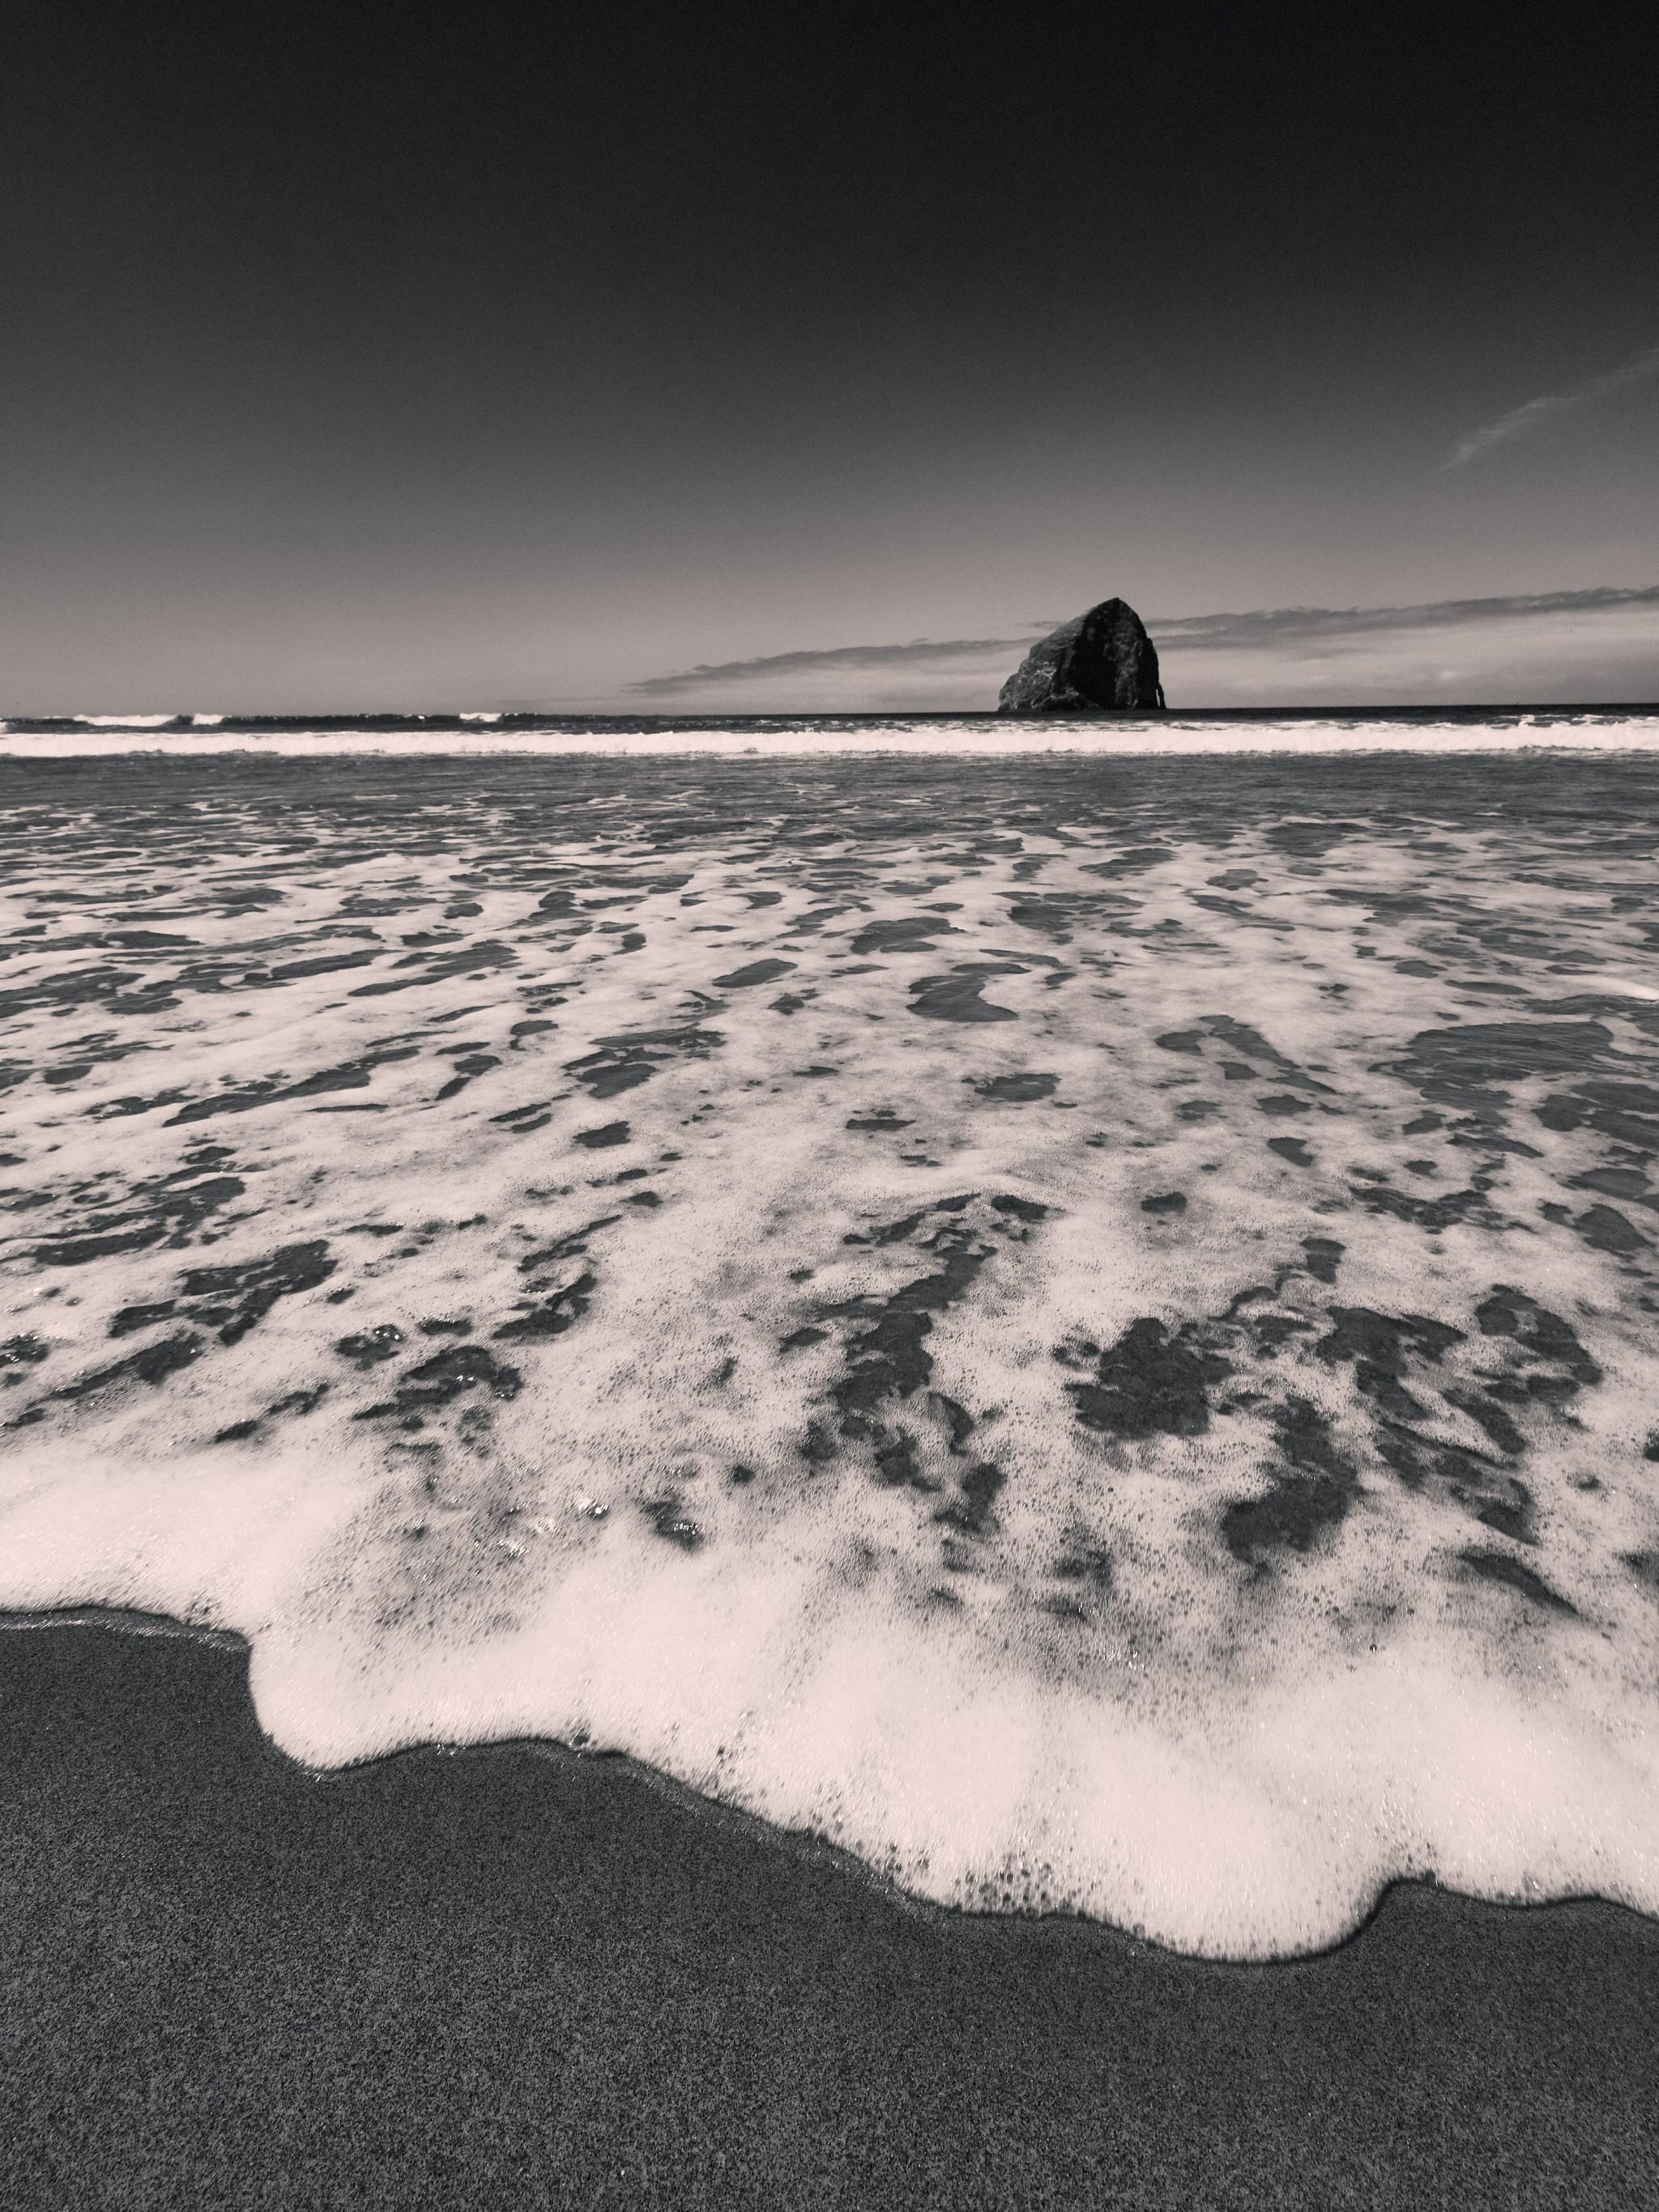 02-Surf.jpg